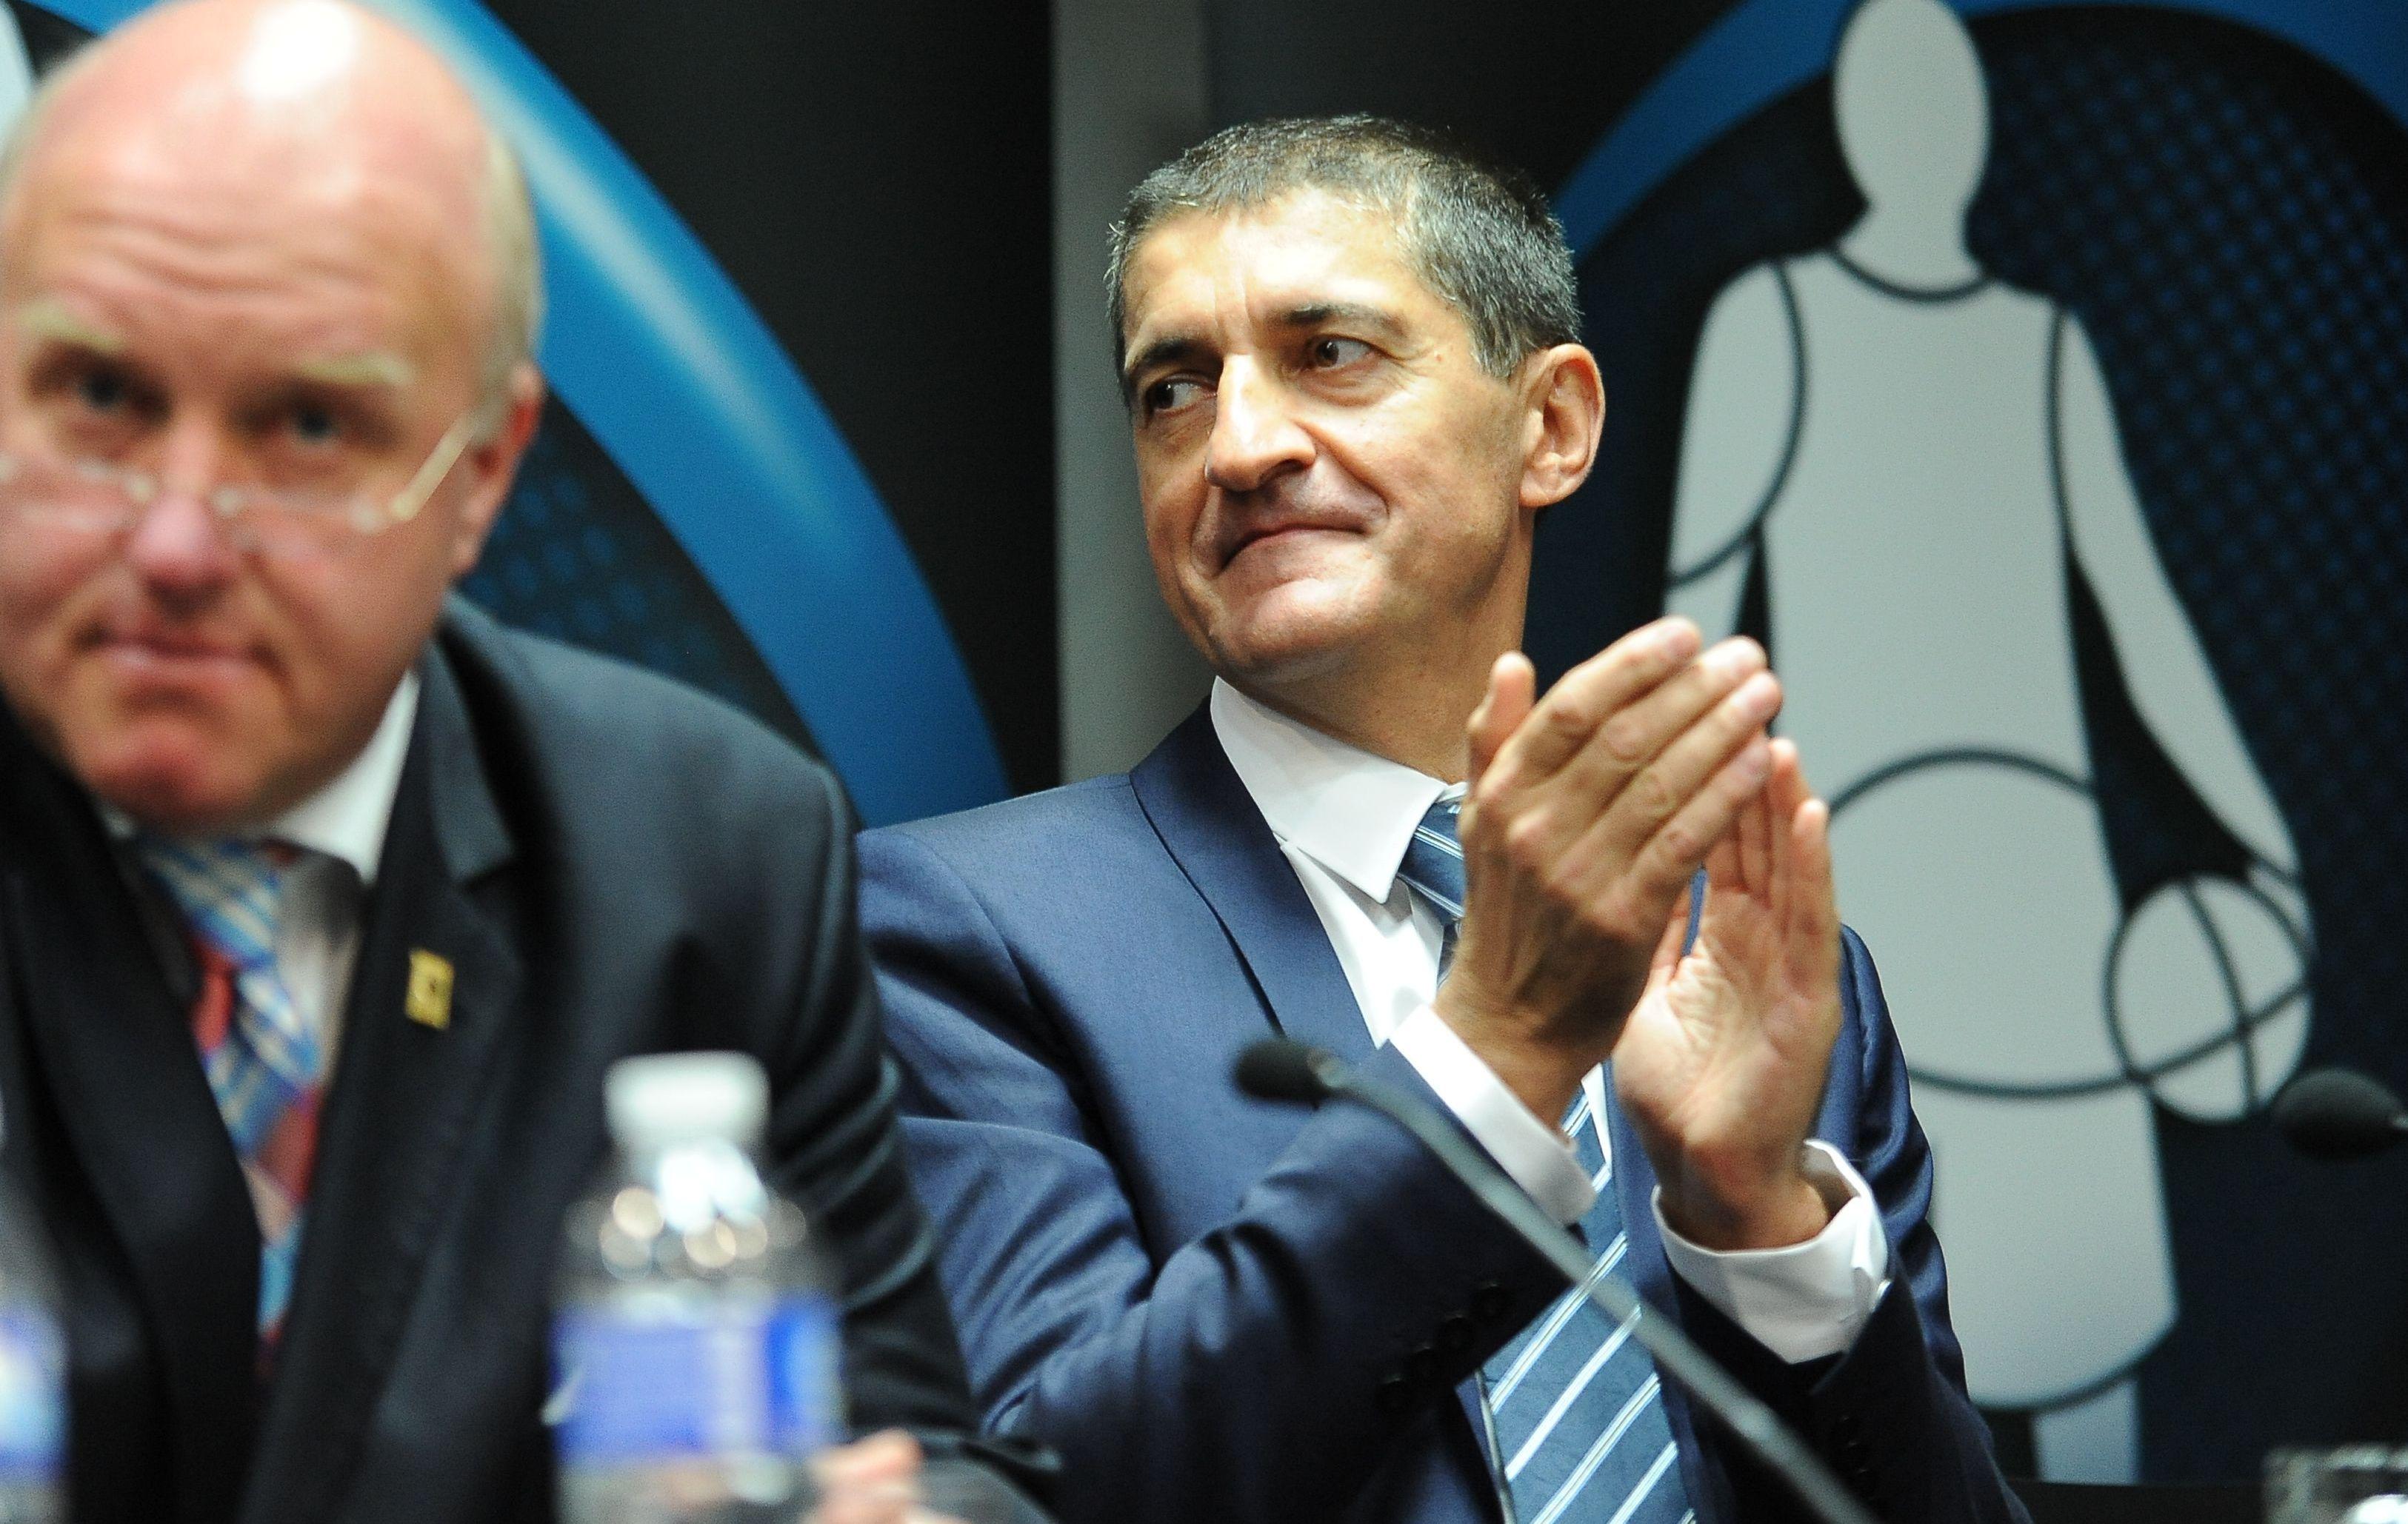 Basket - Euroligue - Siutat : �L?Euroligue et l?Eurocoupe, c?est fini�